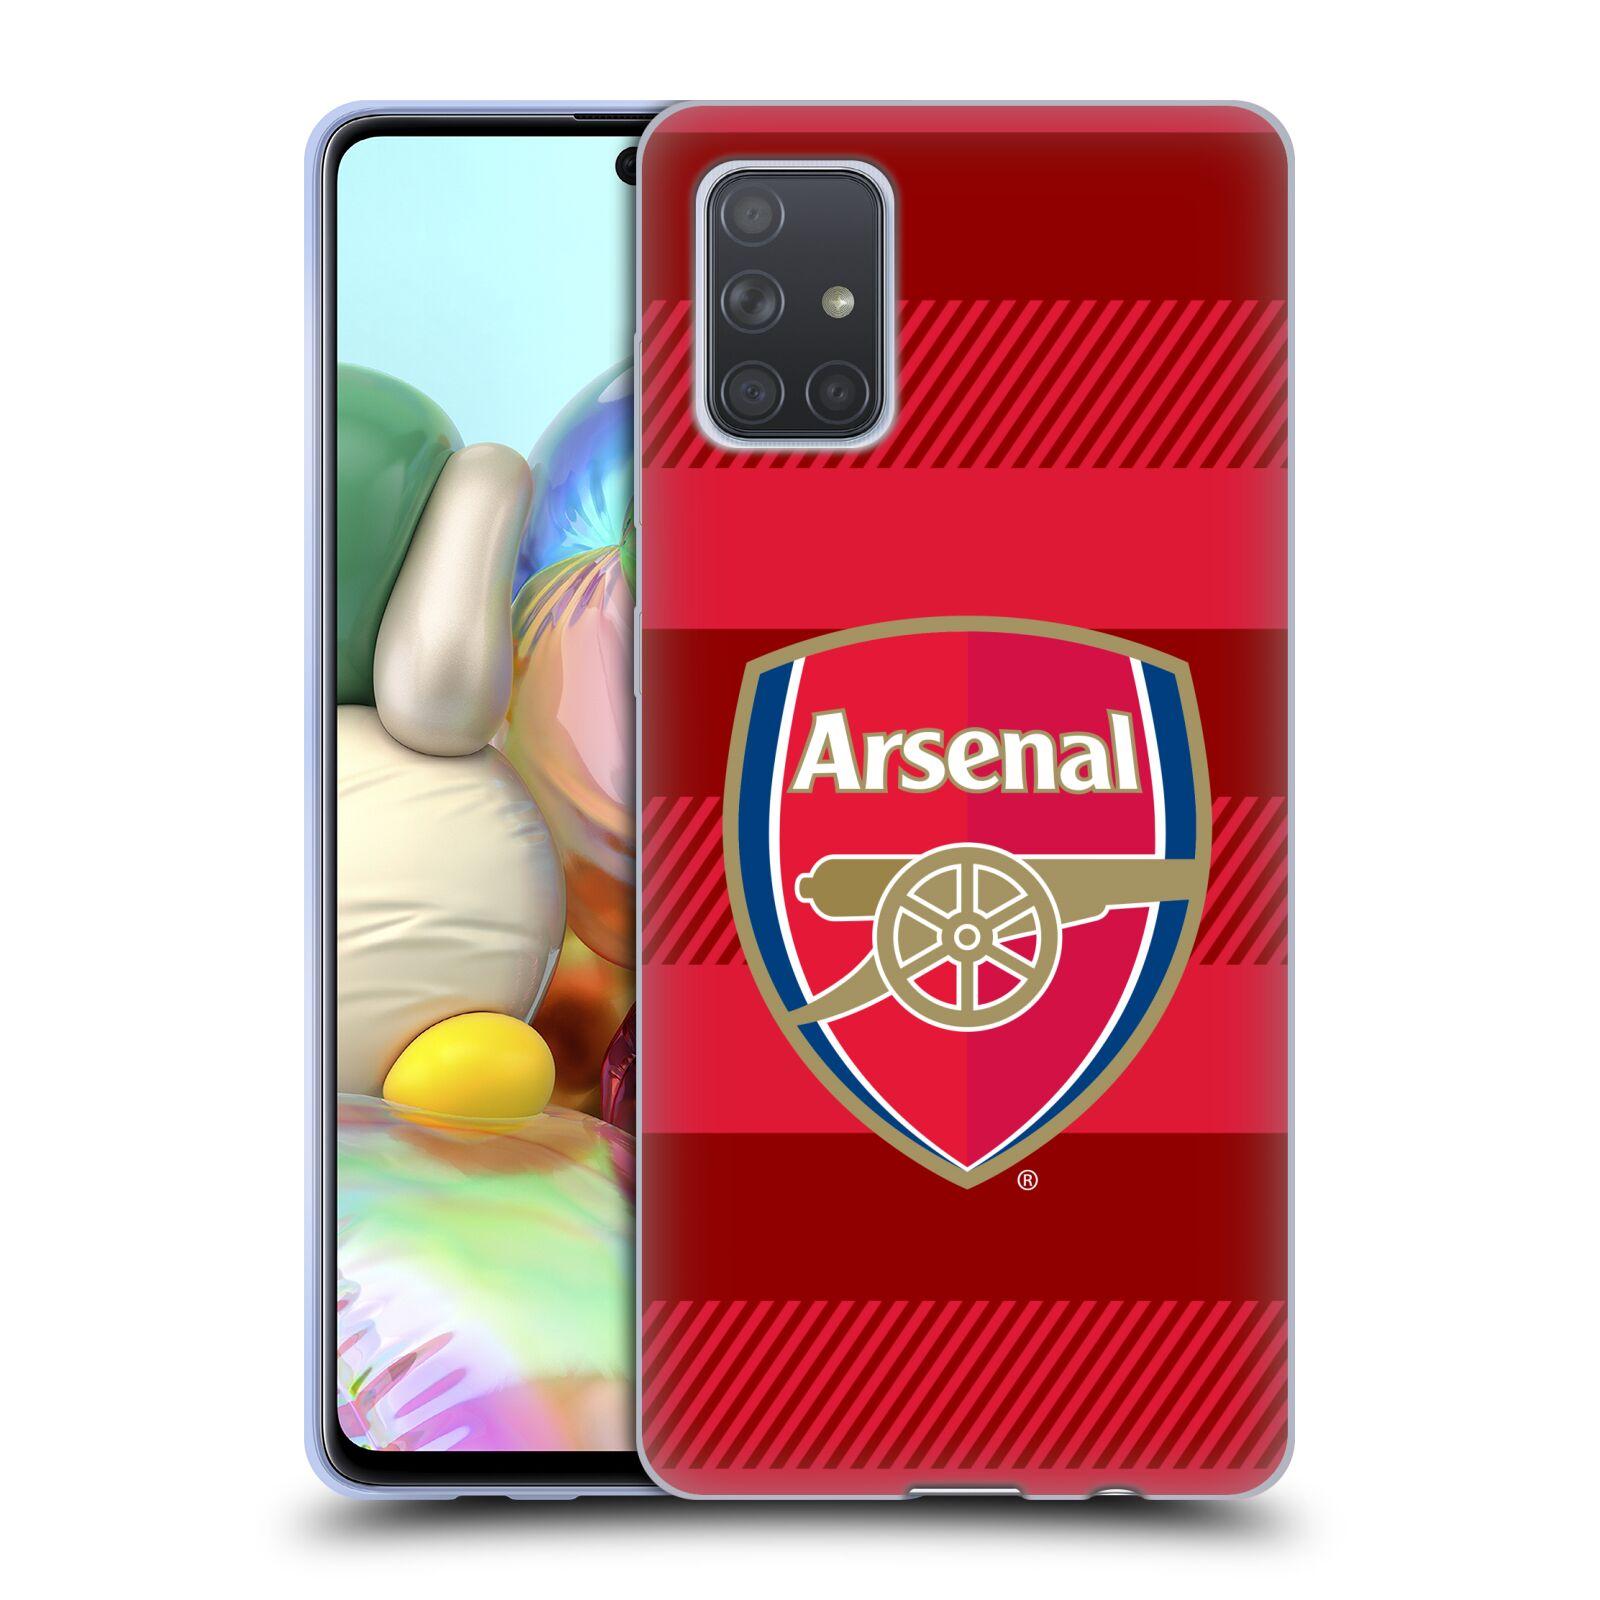 Silikonové pouzdro na mobil Samsung Galaxy A71 - Head Case - Arsenal FC - Logo s pruhy